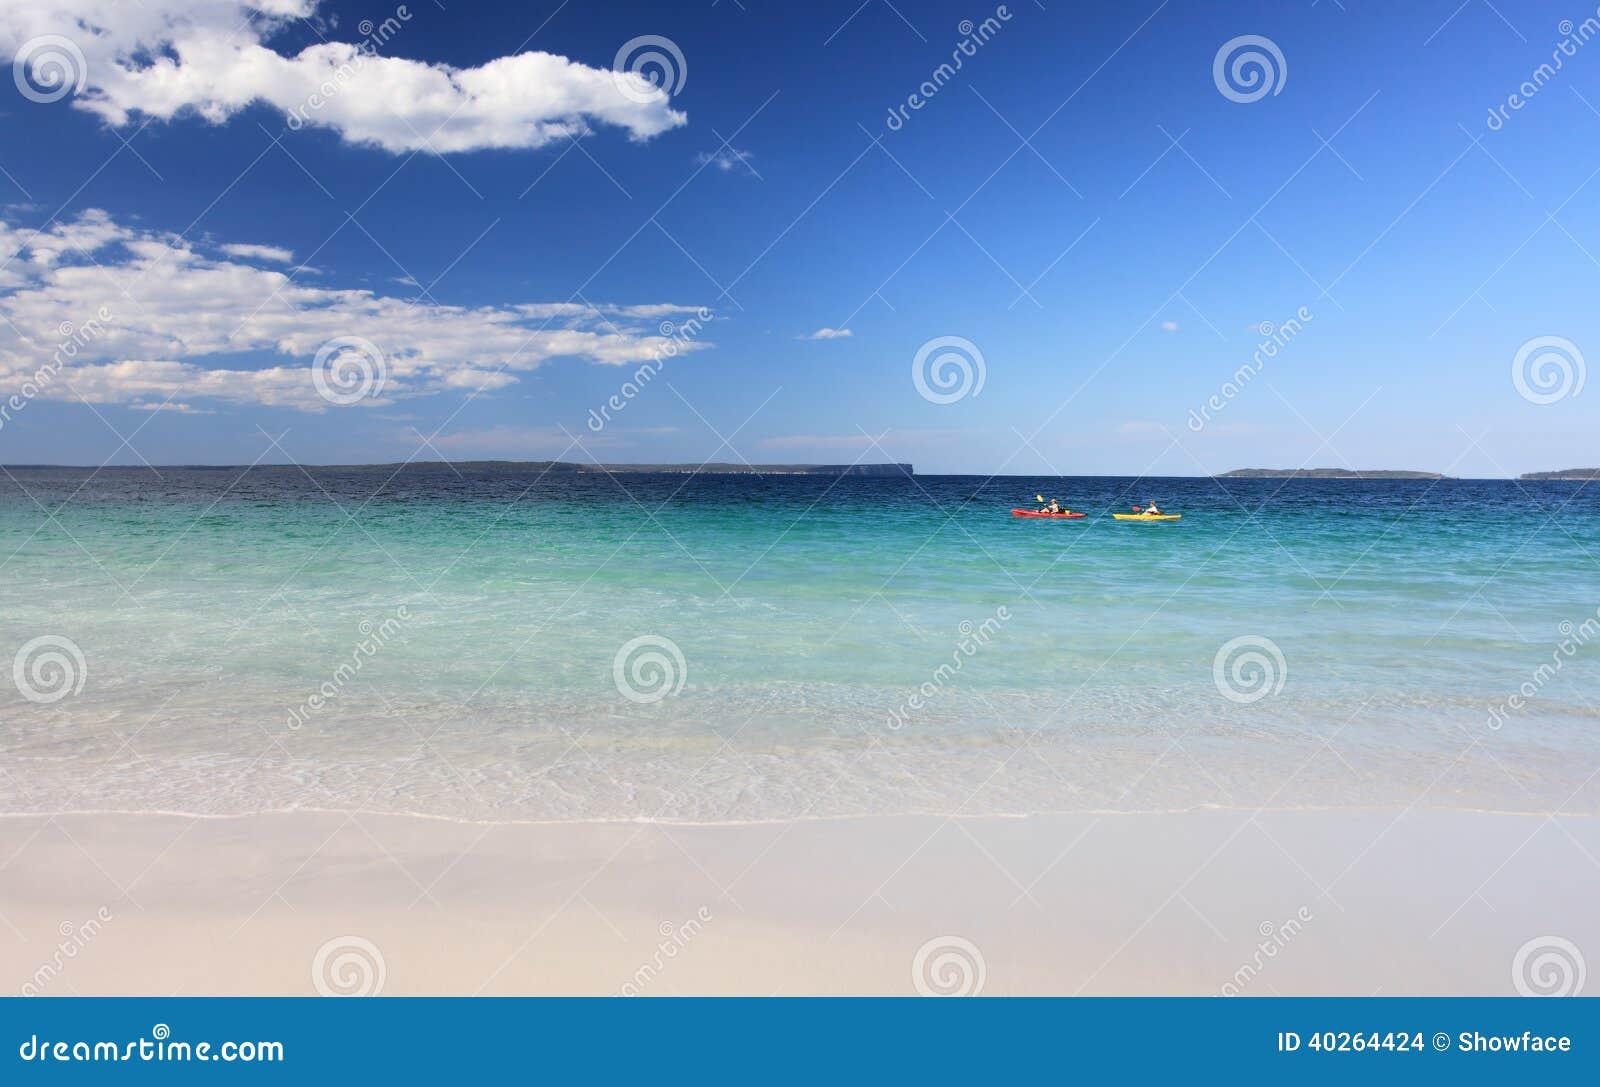 Kayakers enjoy the crystal clear waters Australian Beach